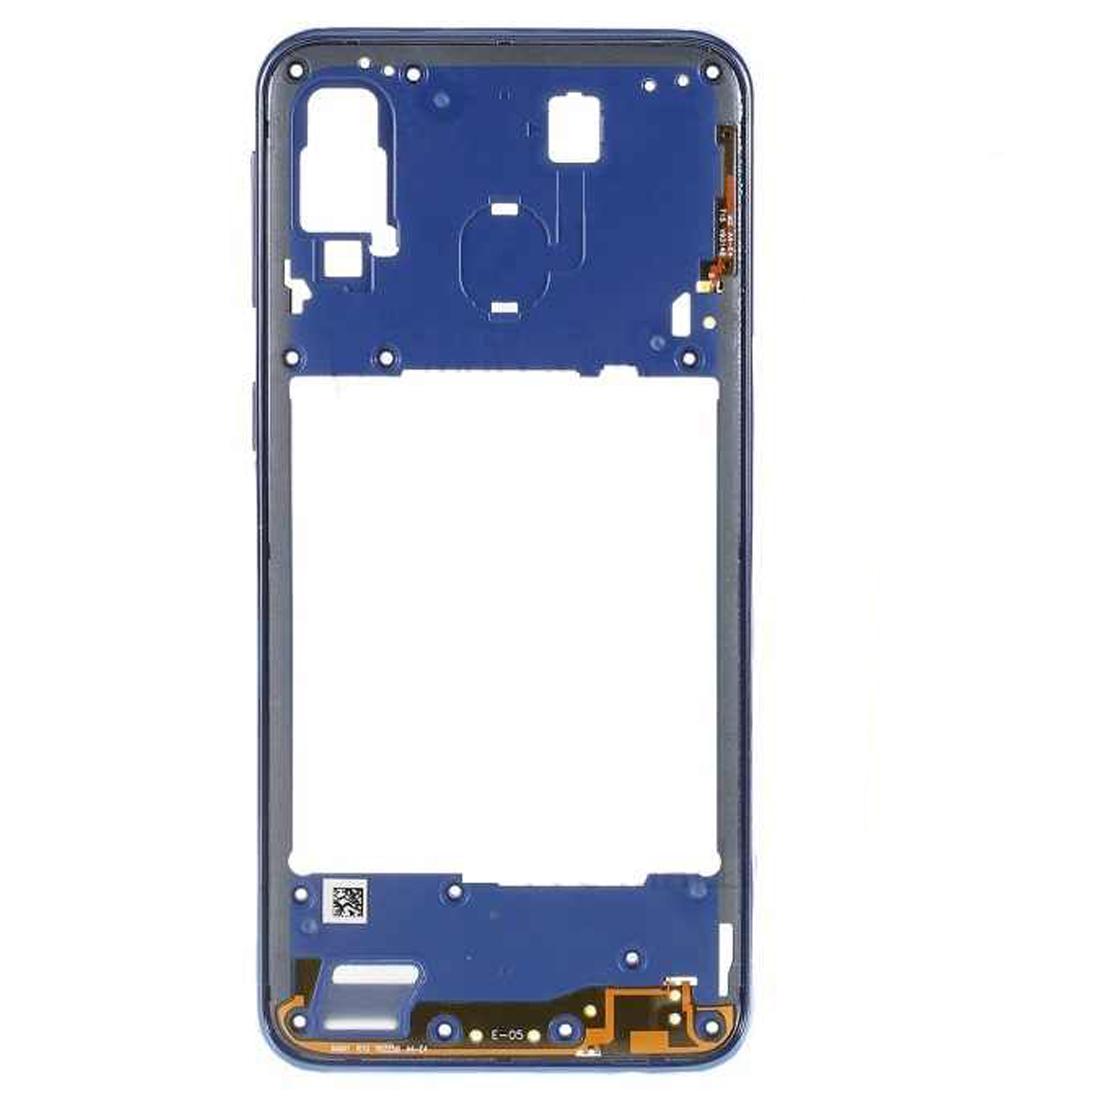 Carcasa intermedia para Samsung Galaxy A40 A405F – Azul